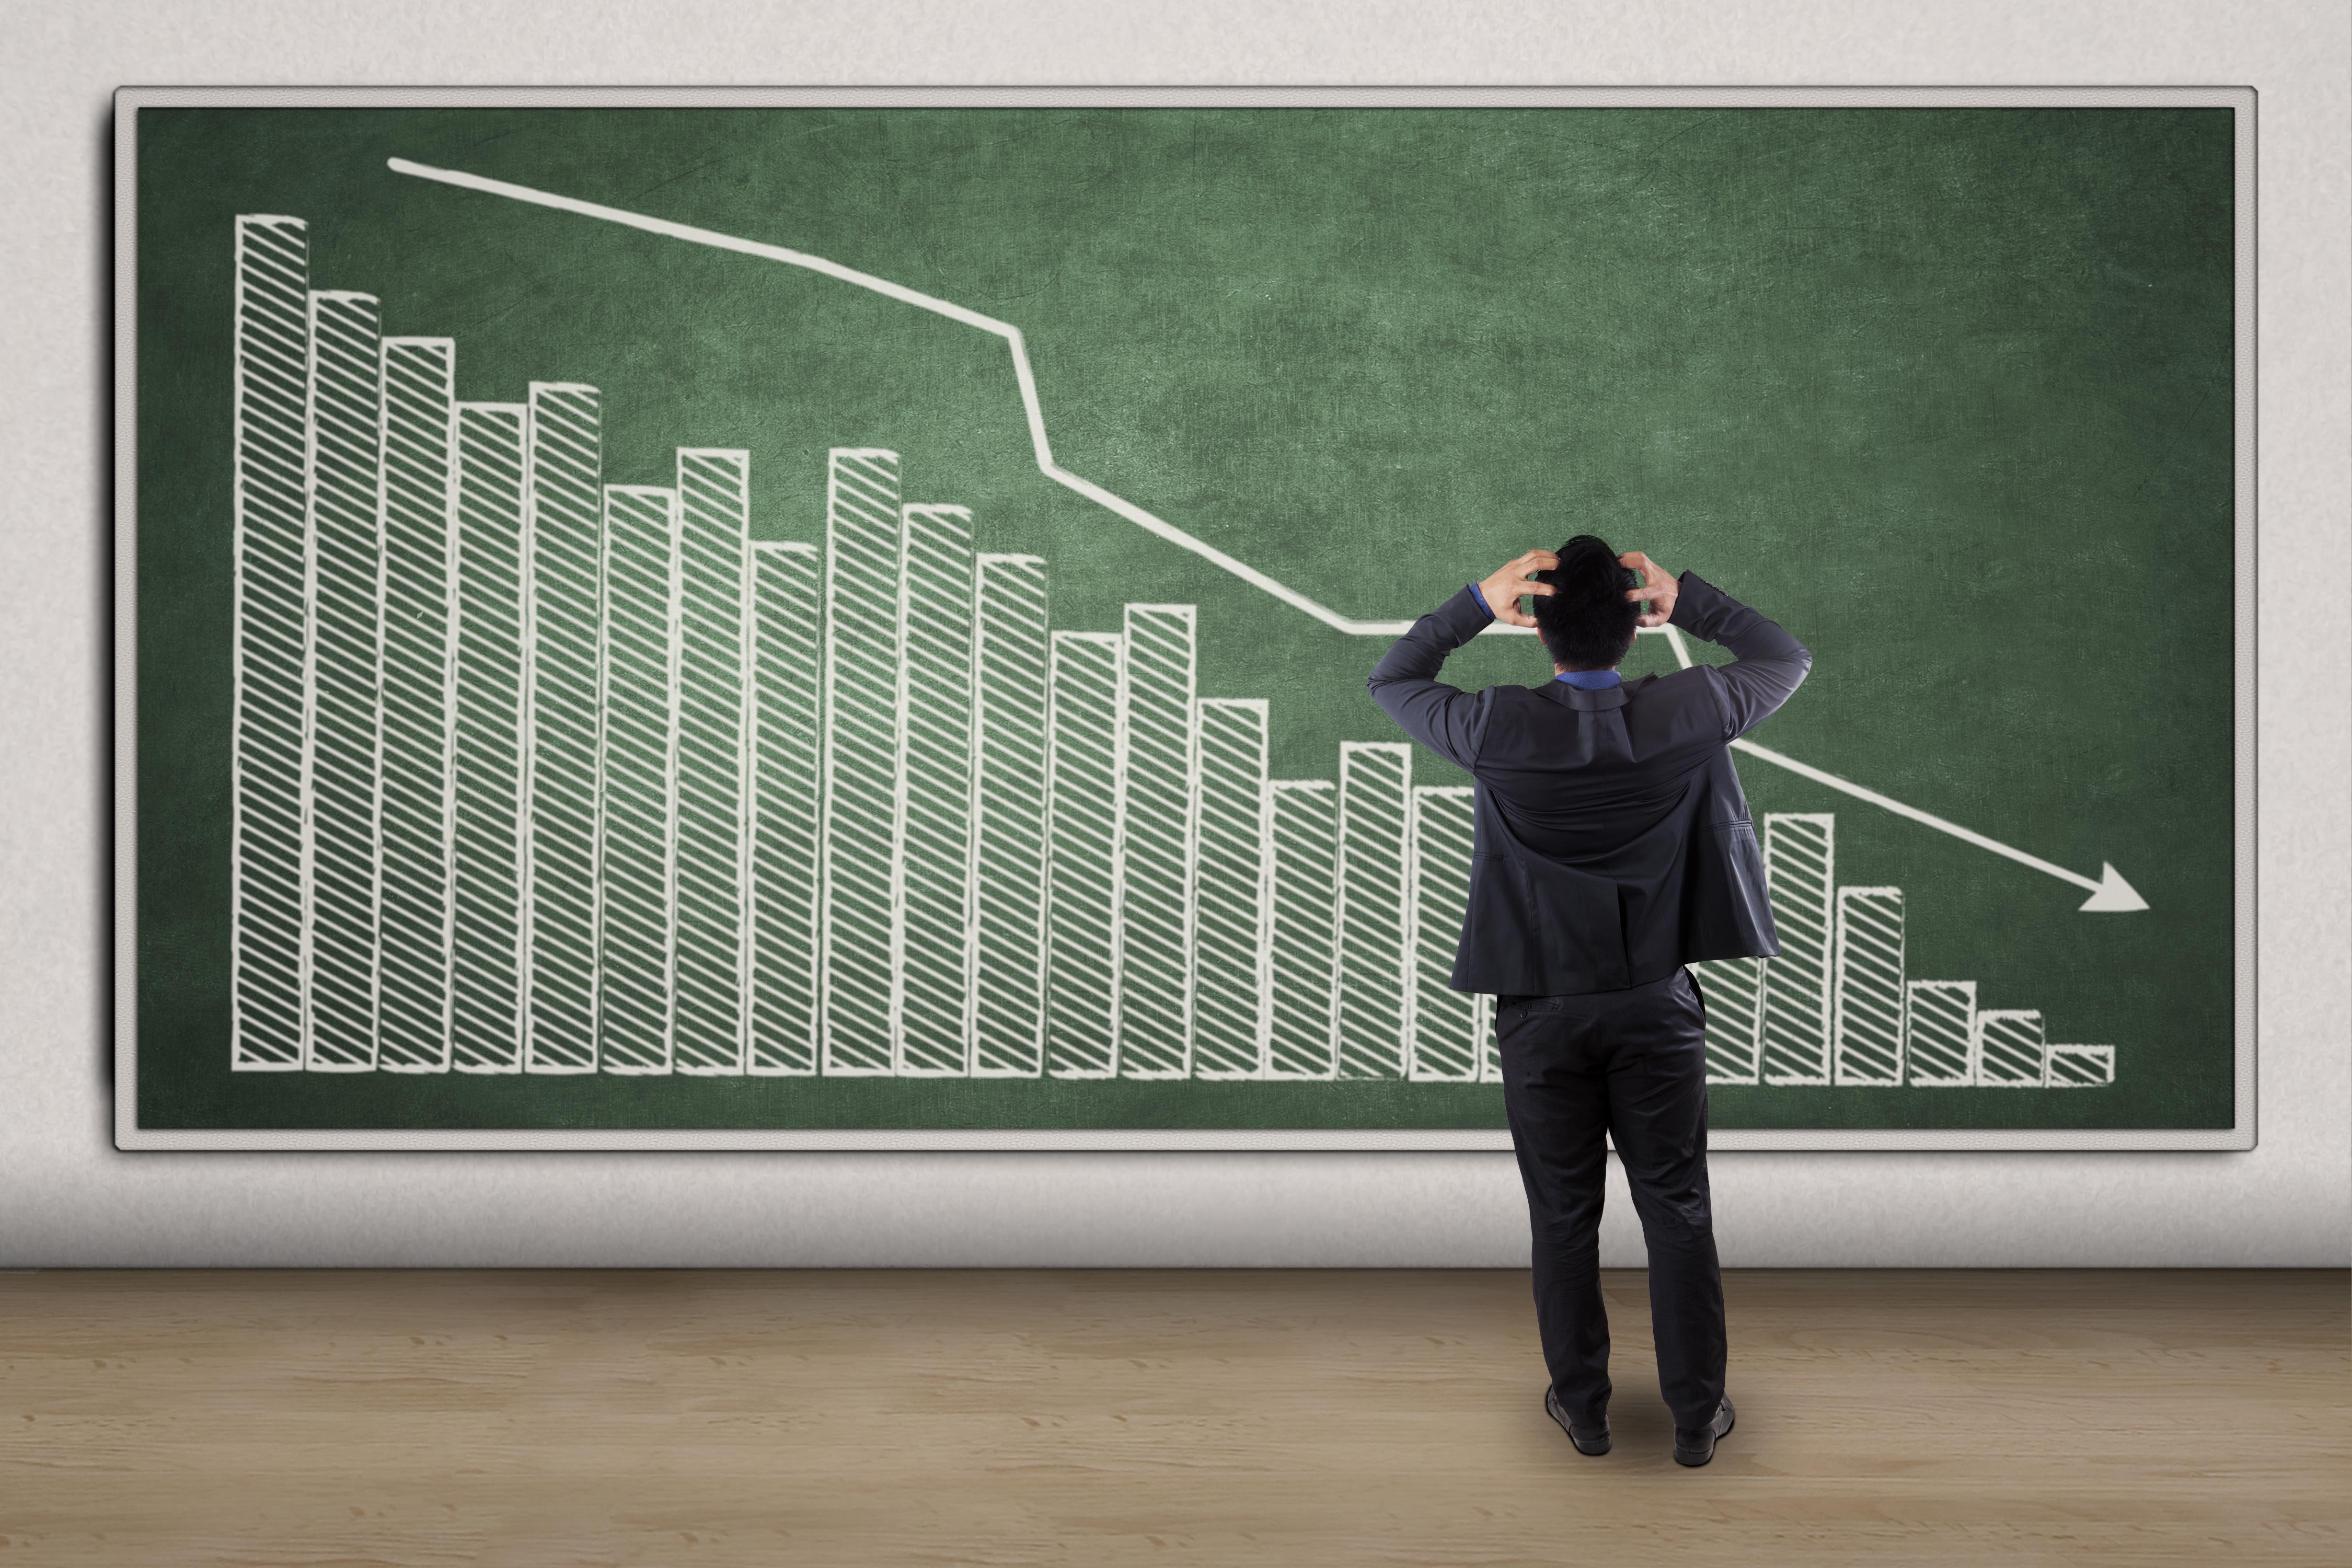 An arrow following a downward trending graph on a chalkboard.